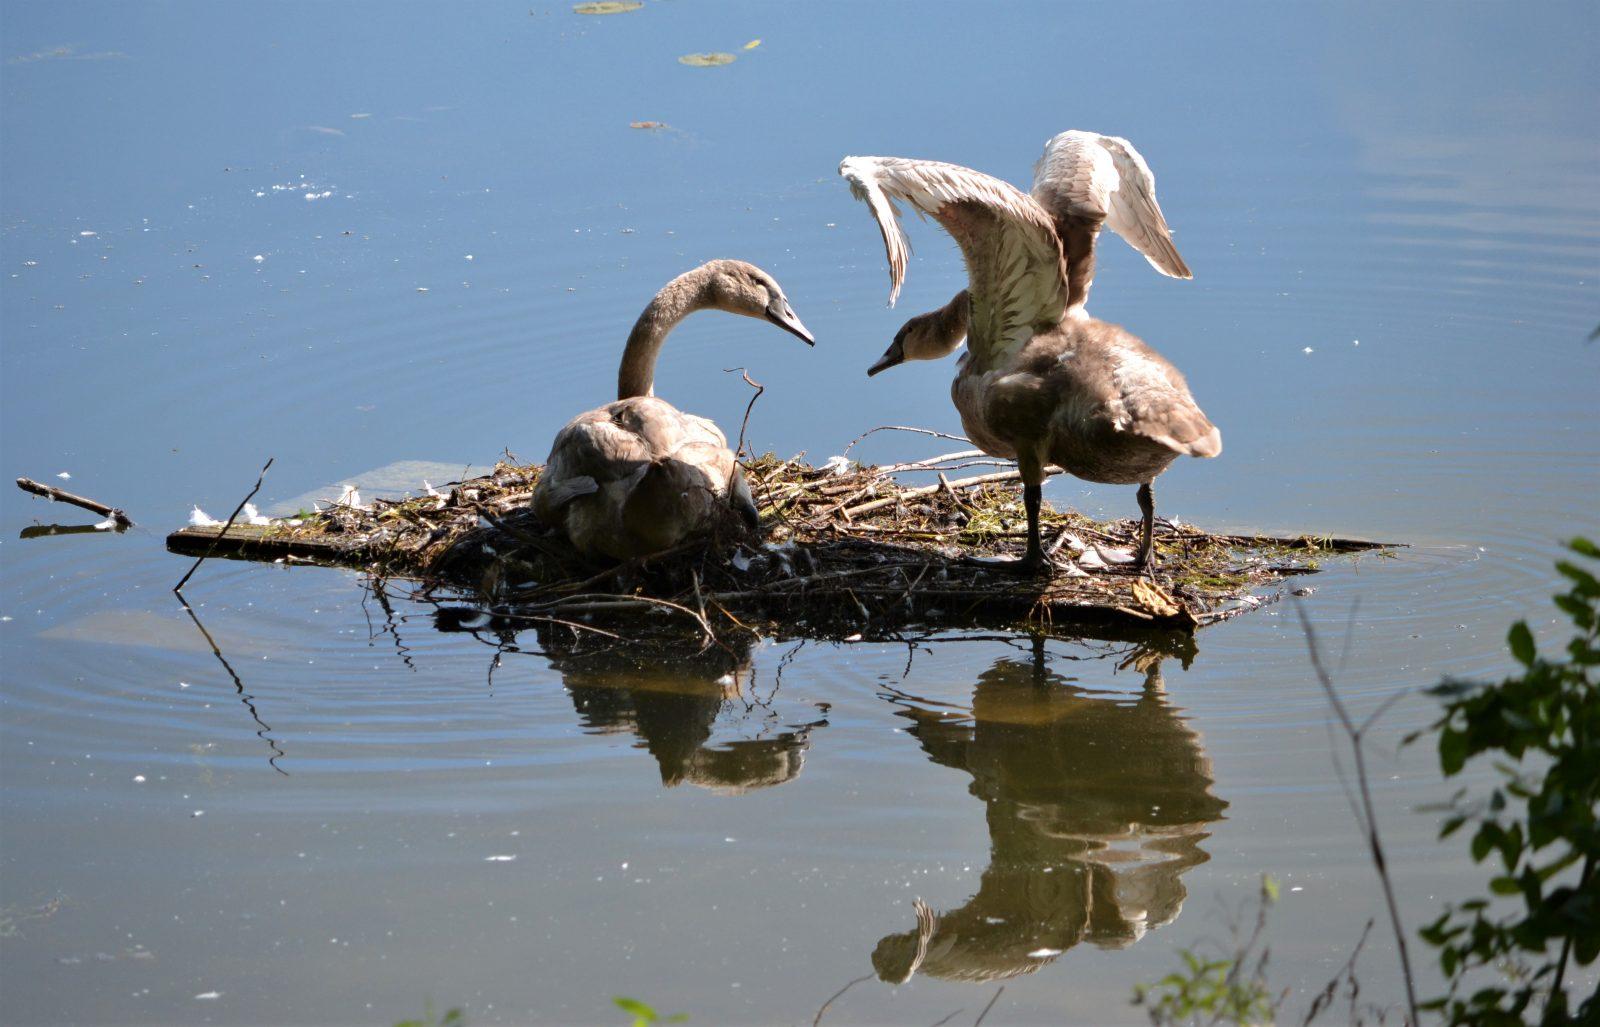 Two Mute Swan Cygnets